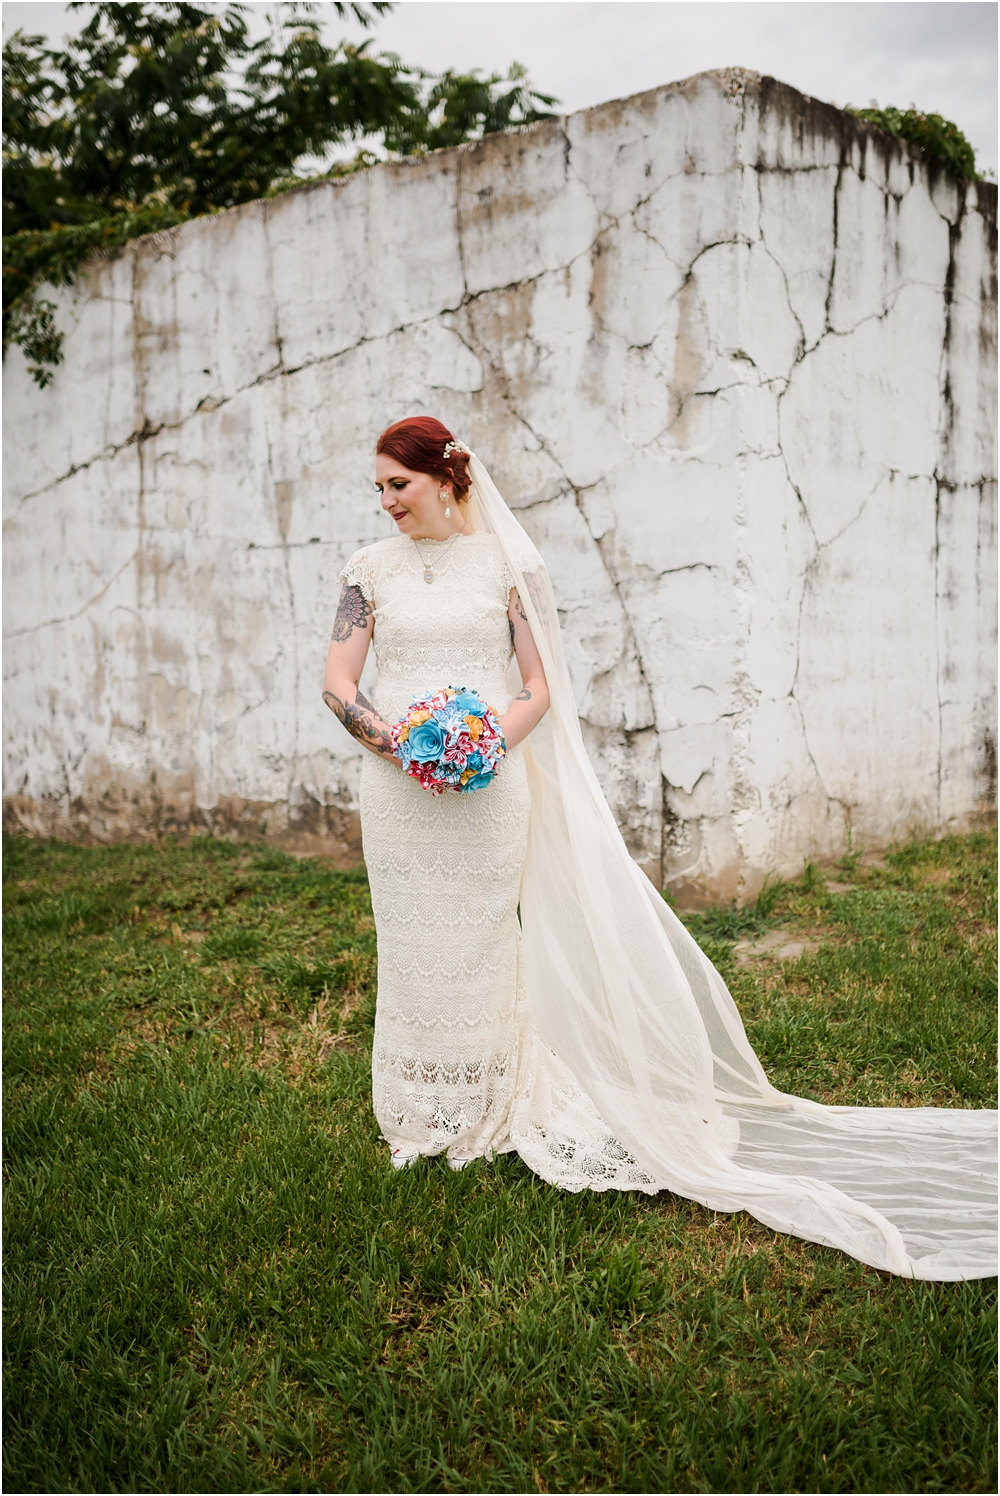 the-barn-at-wateroaks-circus-florida-wedding-photographer-kiersten-stevenson-photography-81.jpg